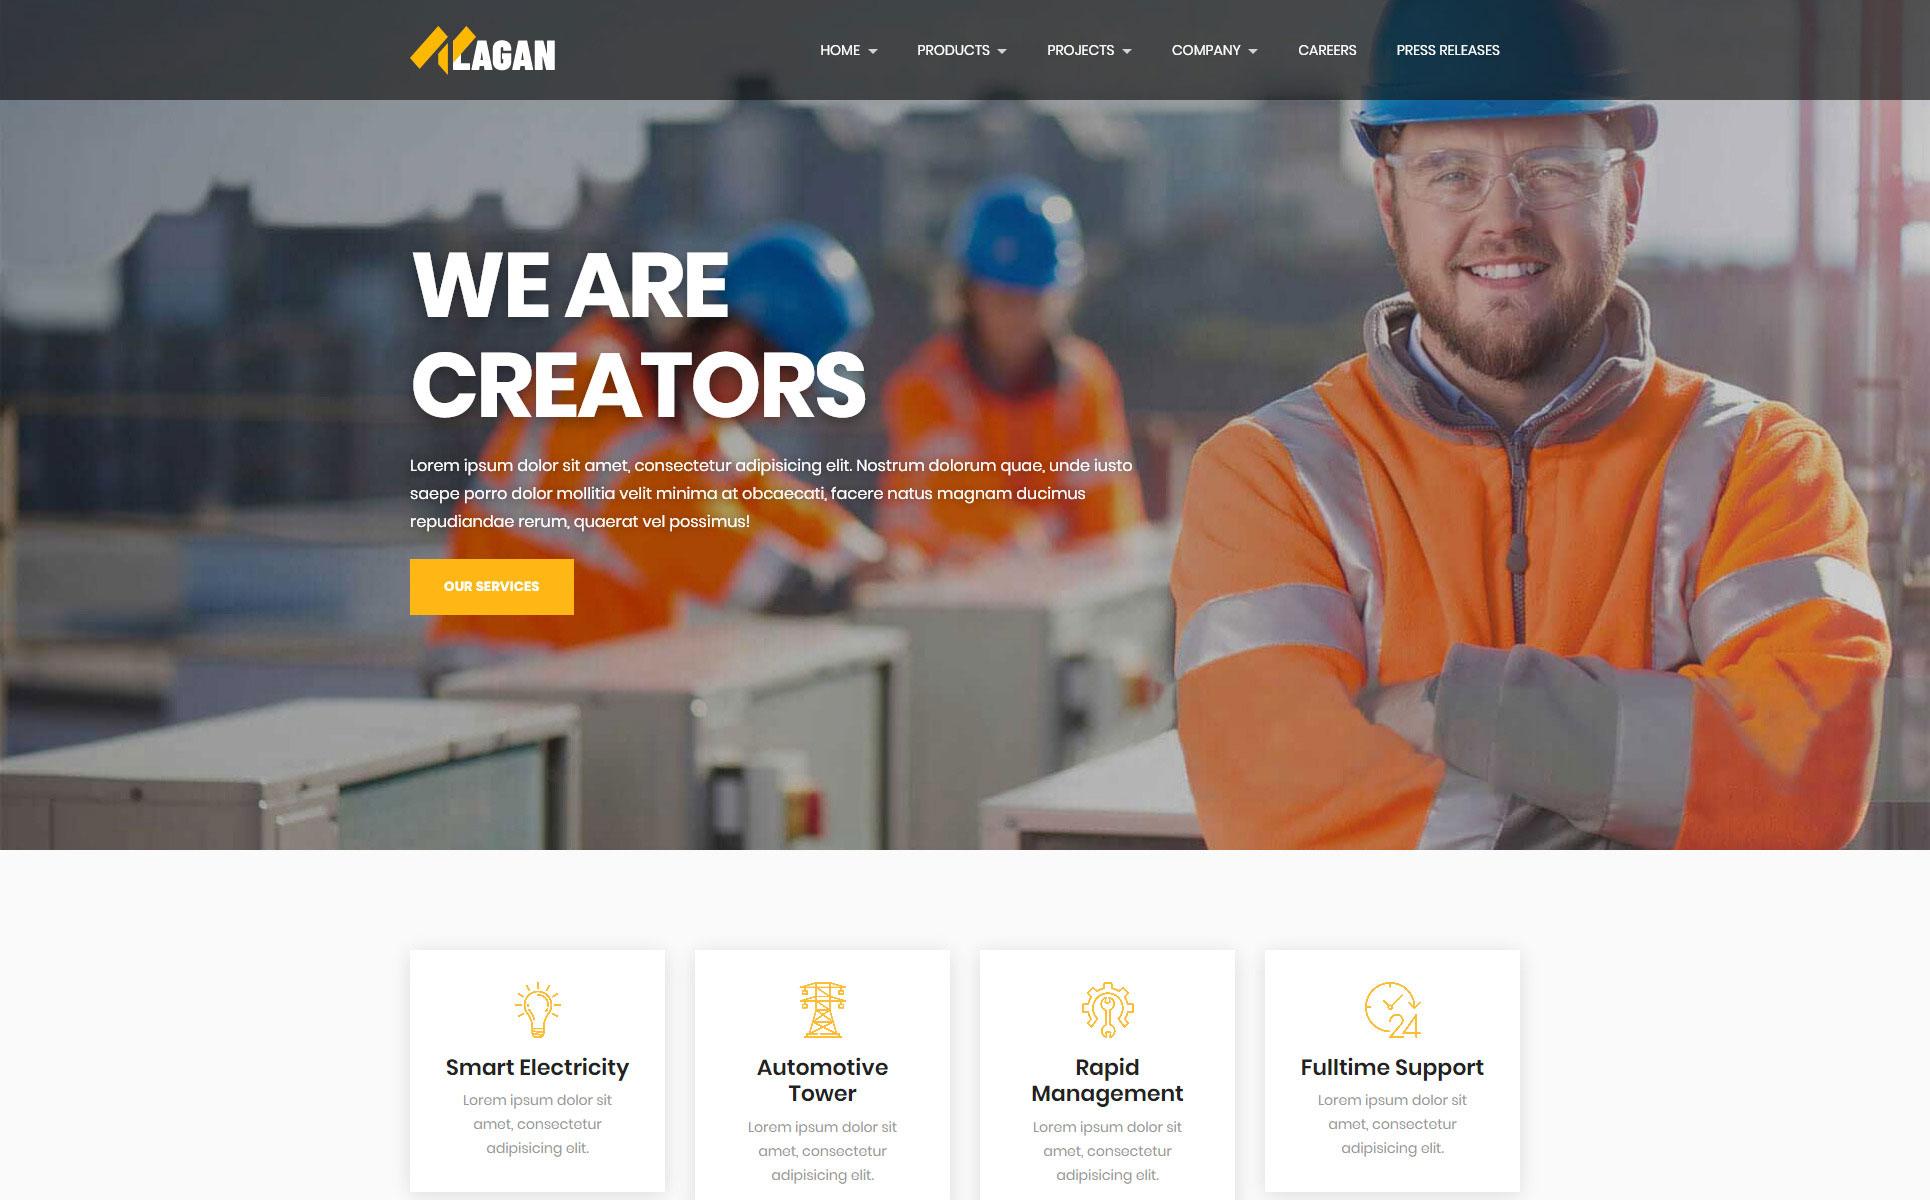 Lagan - Multipurpose Industrial & Factory Landing Page Template